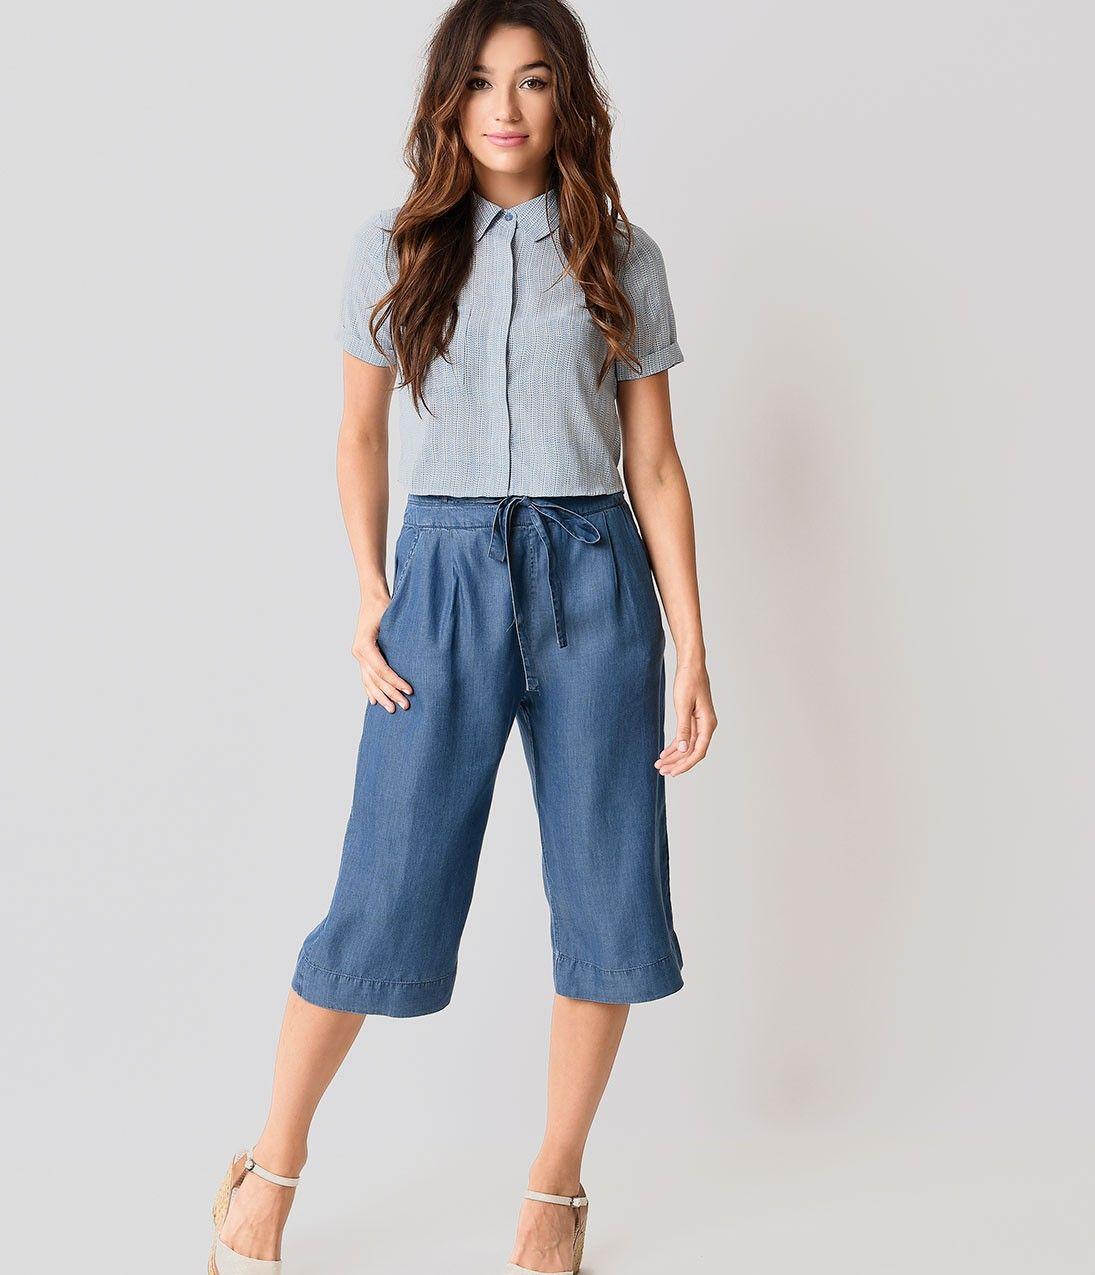 1930s Style Blue Jean High Waist Gaucho Pants | Style | Pinterest ...